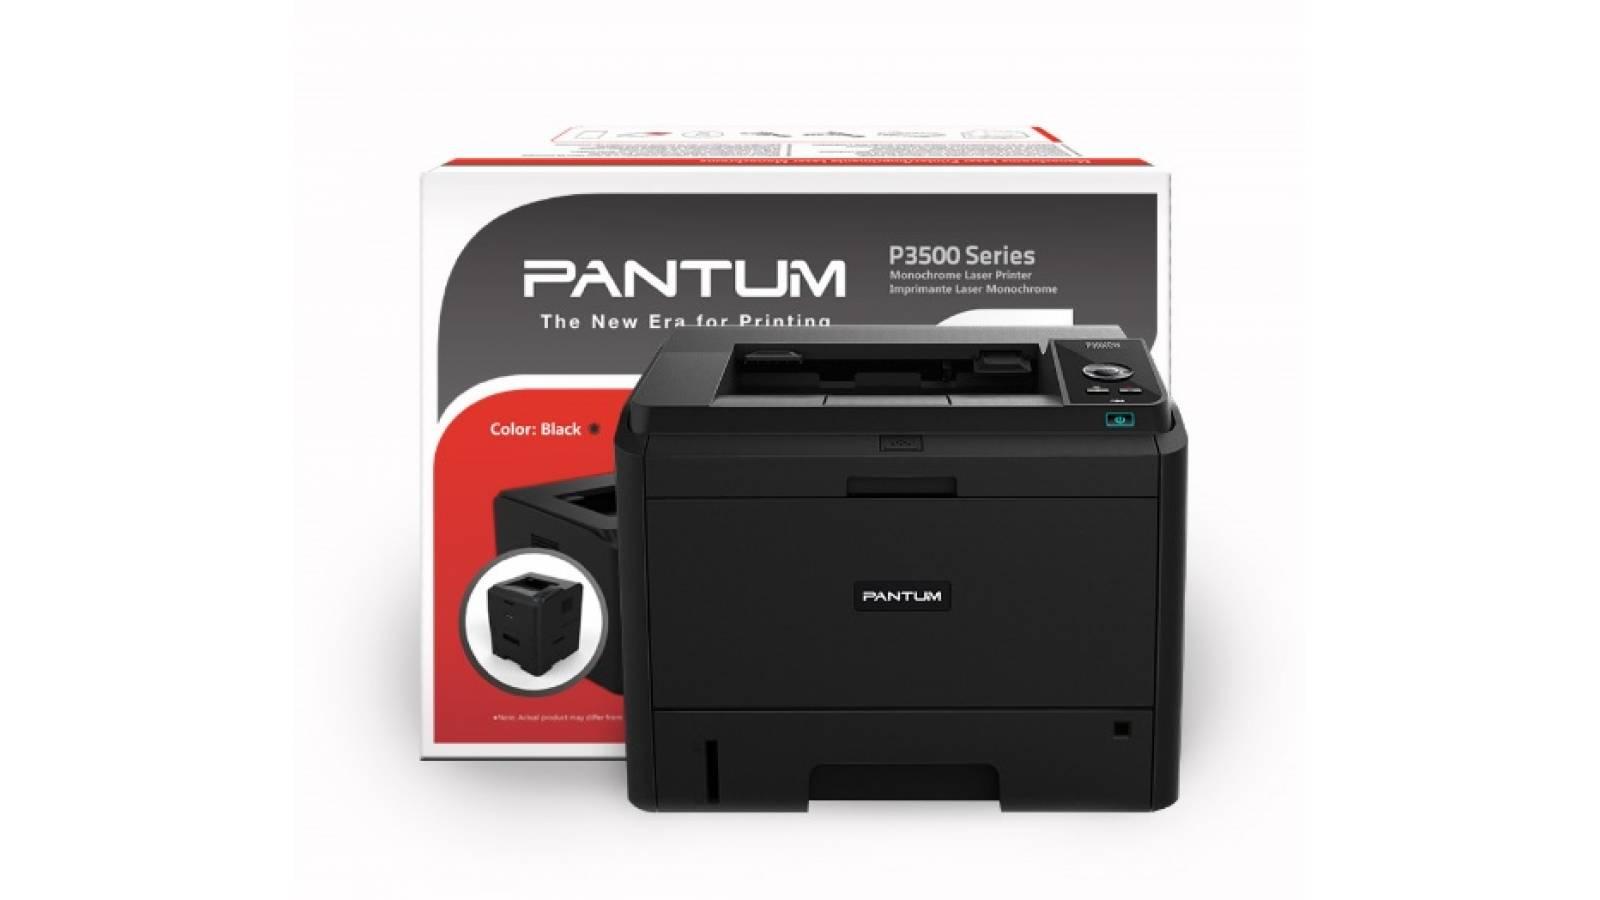 Impresora láser monocromatica Pantum P3500DW